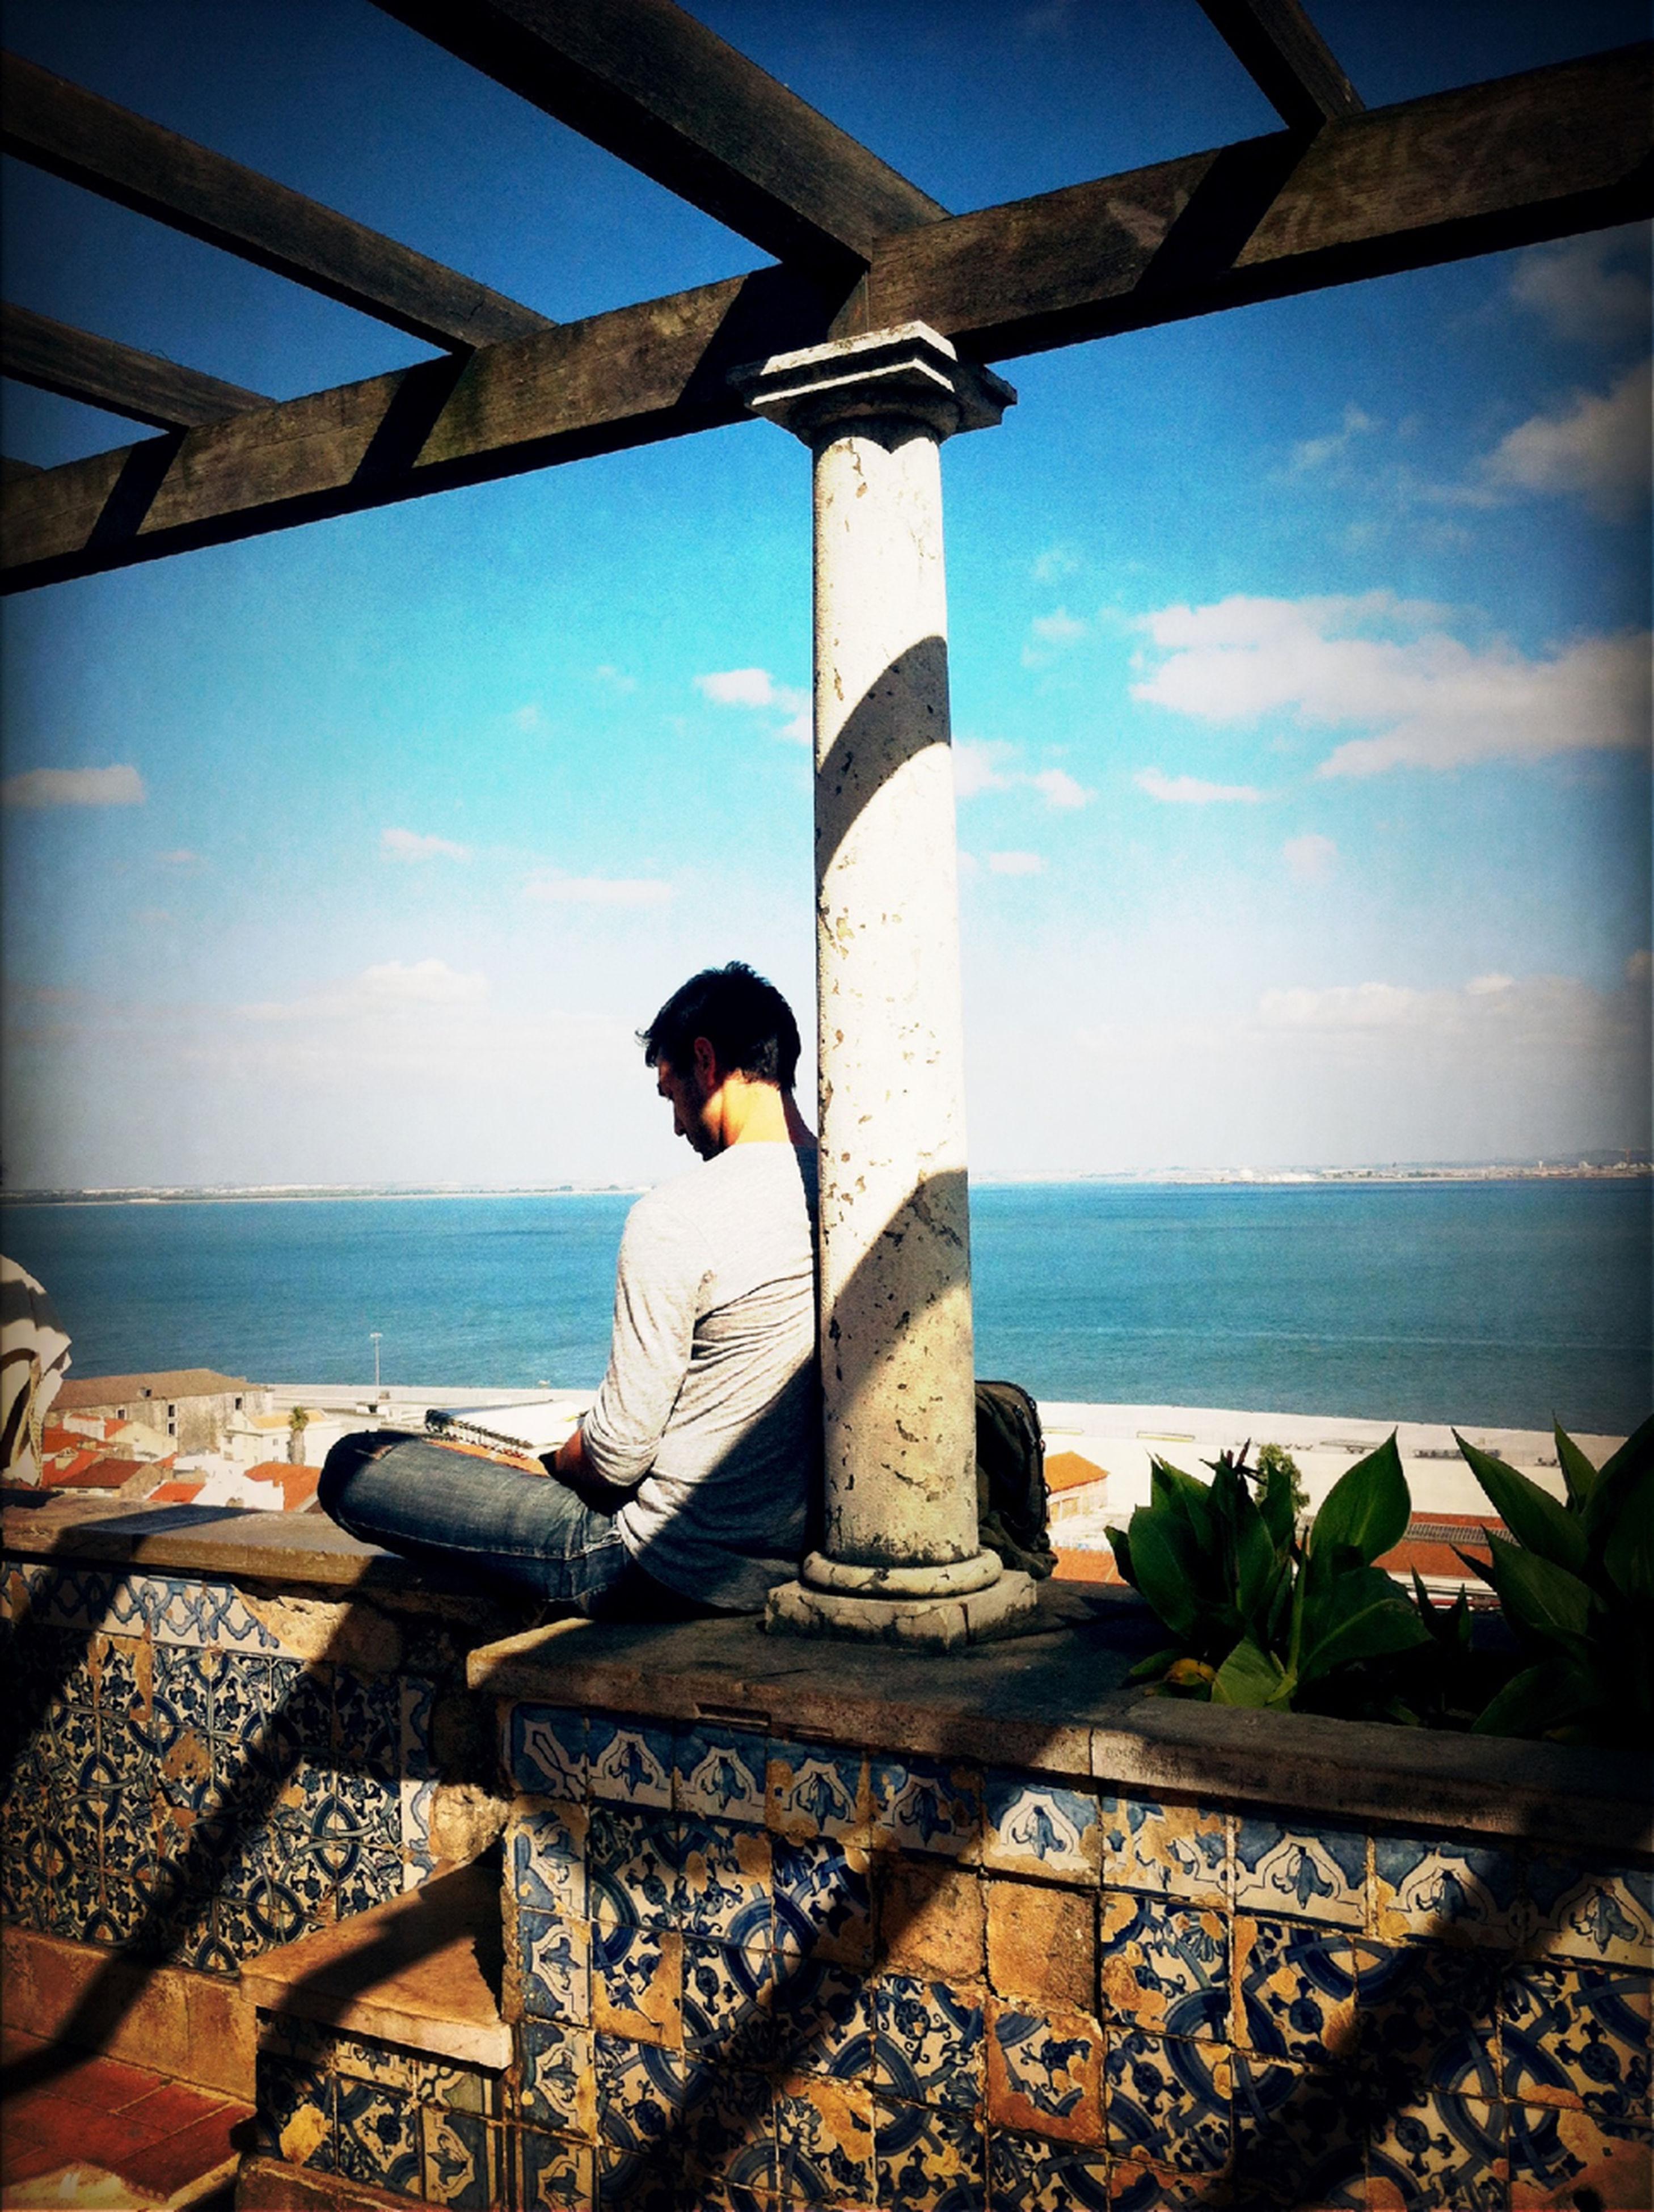 sea, horizon over water, sky, water, cloud - sky, cloud, tranquility, built structure, art, human representation, nature, tranquil scene, beach, art and craft, day, scenics, statue, sculpture, creativity, sunlight